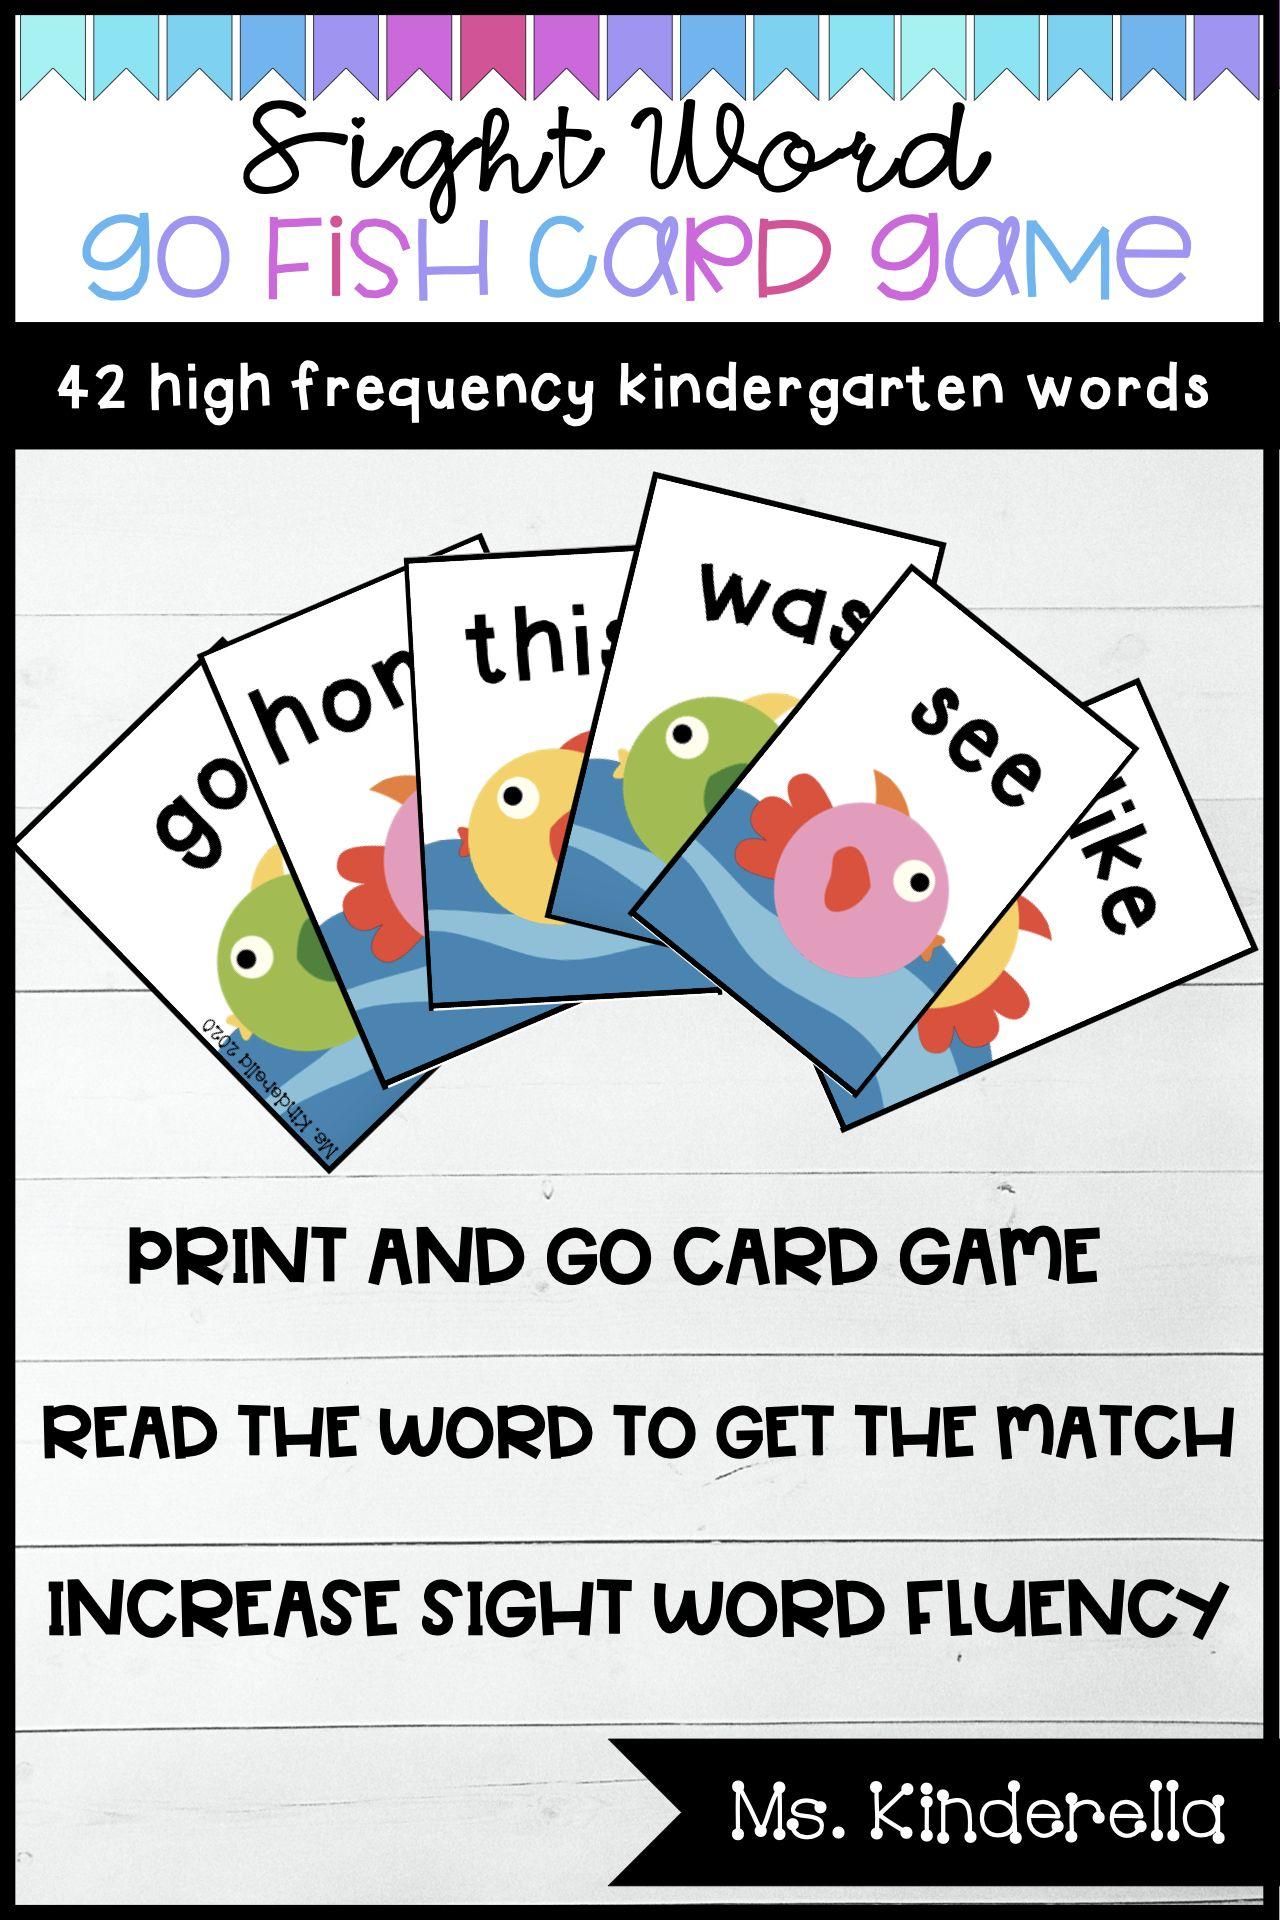 Sight Word Go Fish Partner Card Game Sight Words Sight Word Cards Learning Sight Words